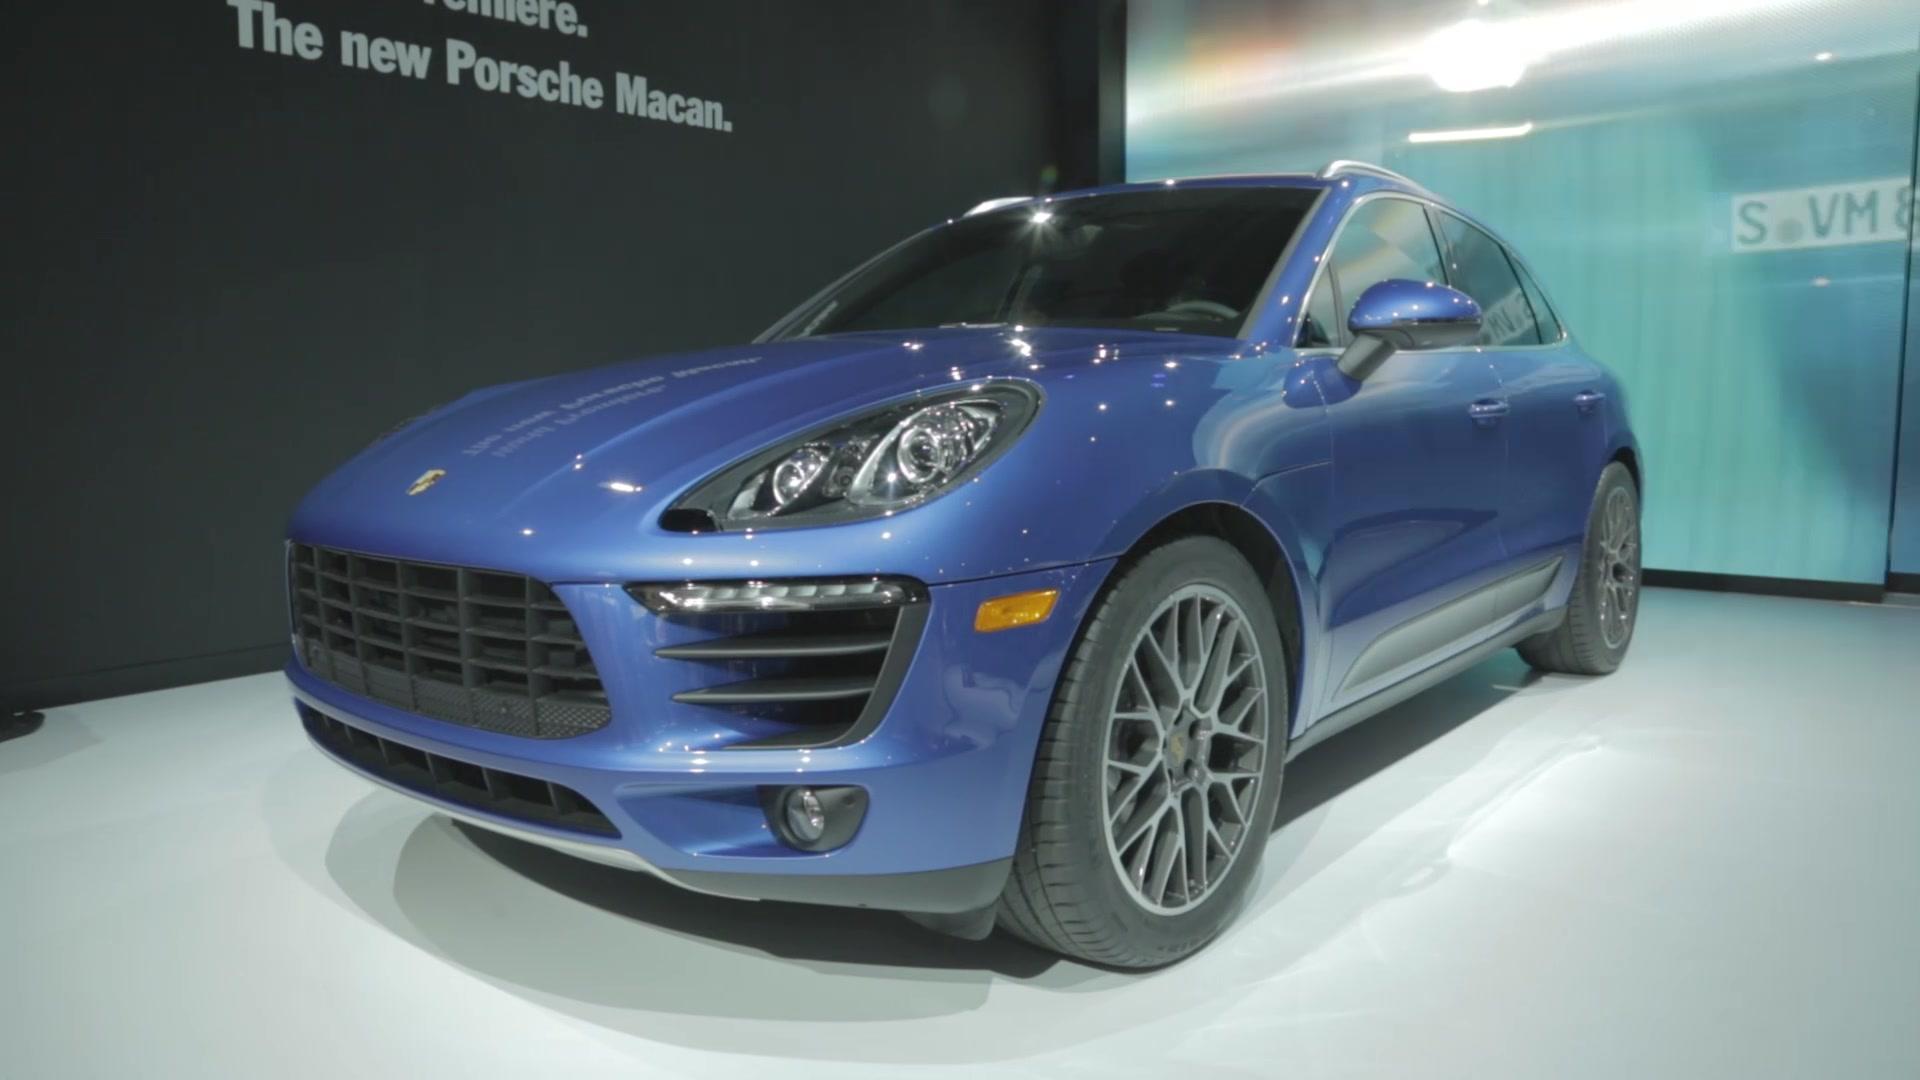 Porsche Macan Crossover Gets Refreshed Interior Bigger Touchscreen